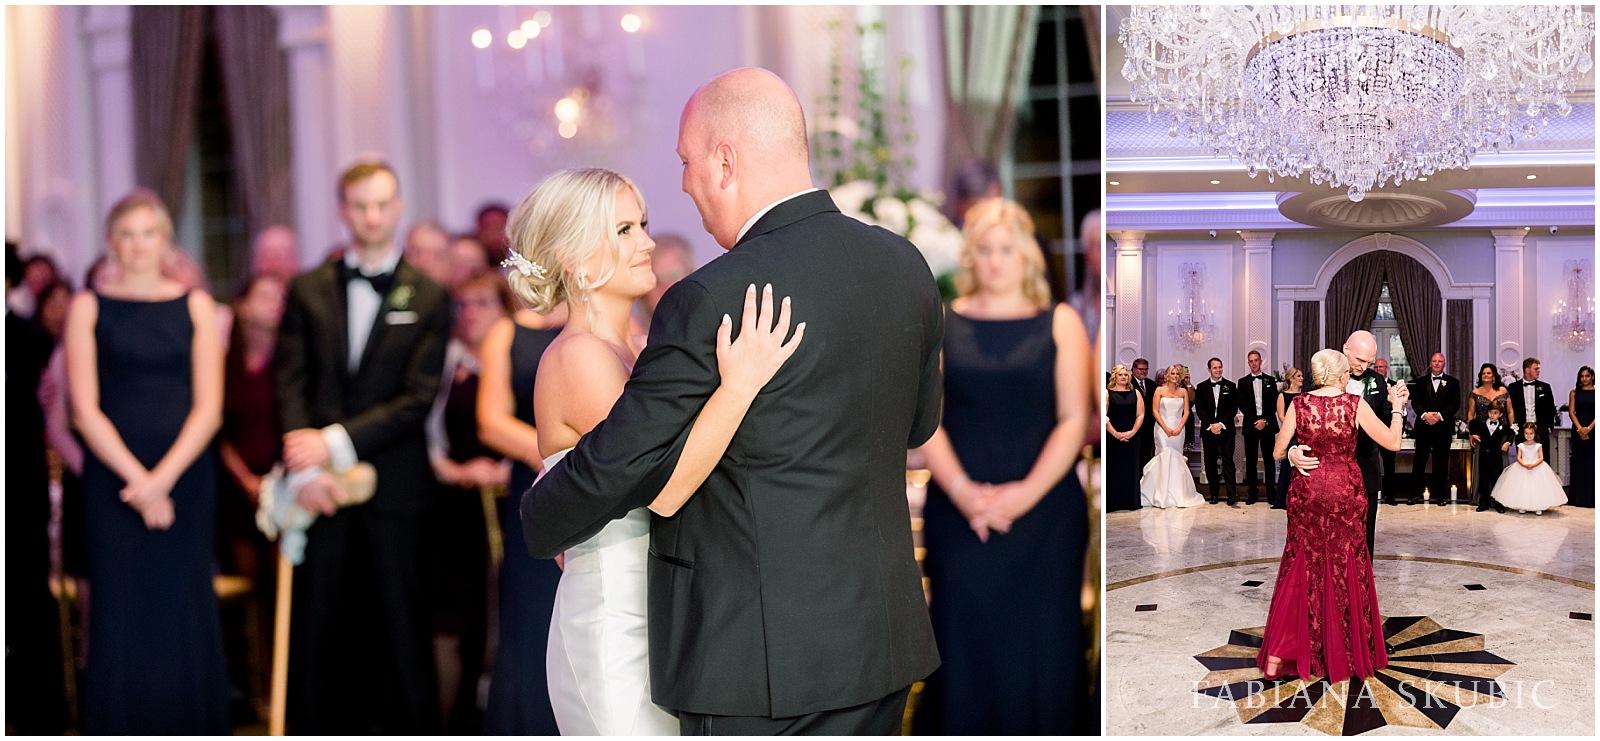 MT-Raleigh-Wedding-Photographer-FSP (83).jpg